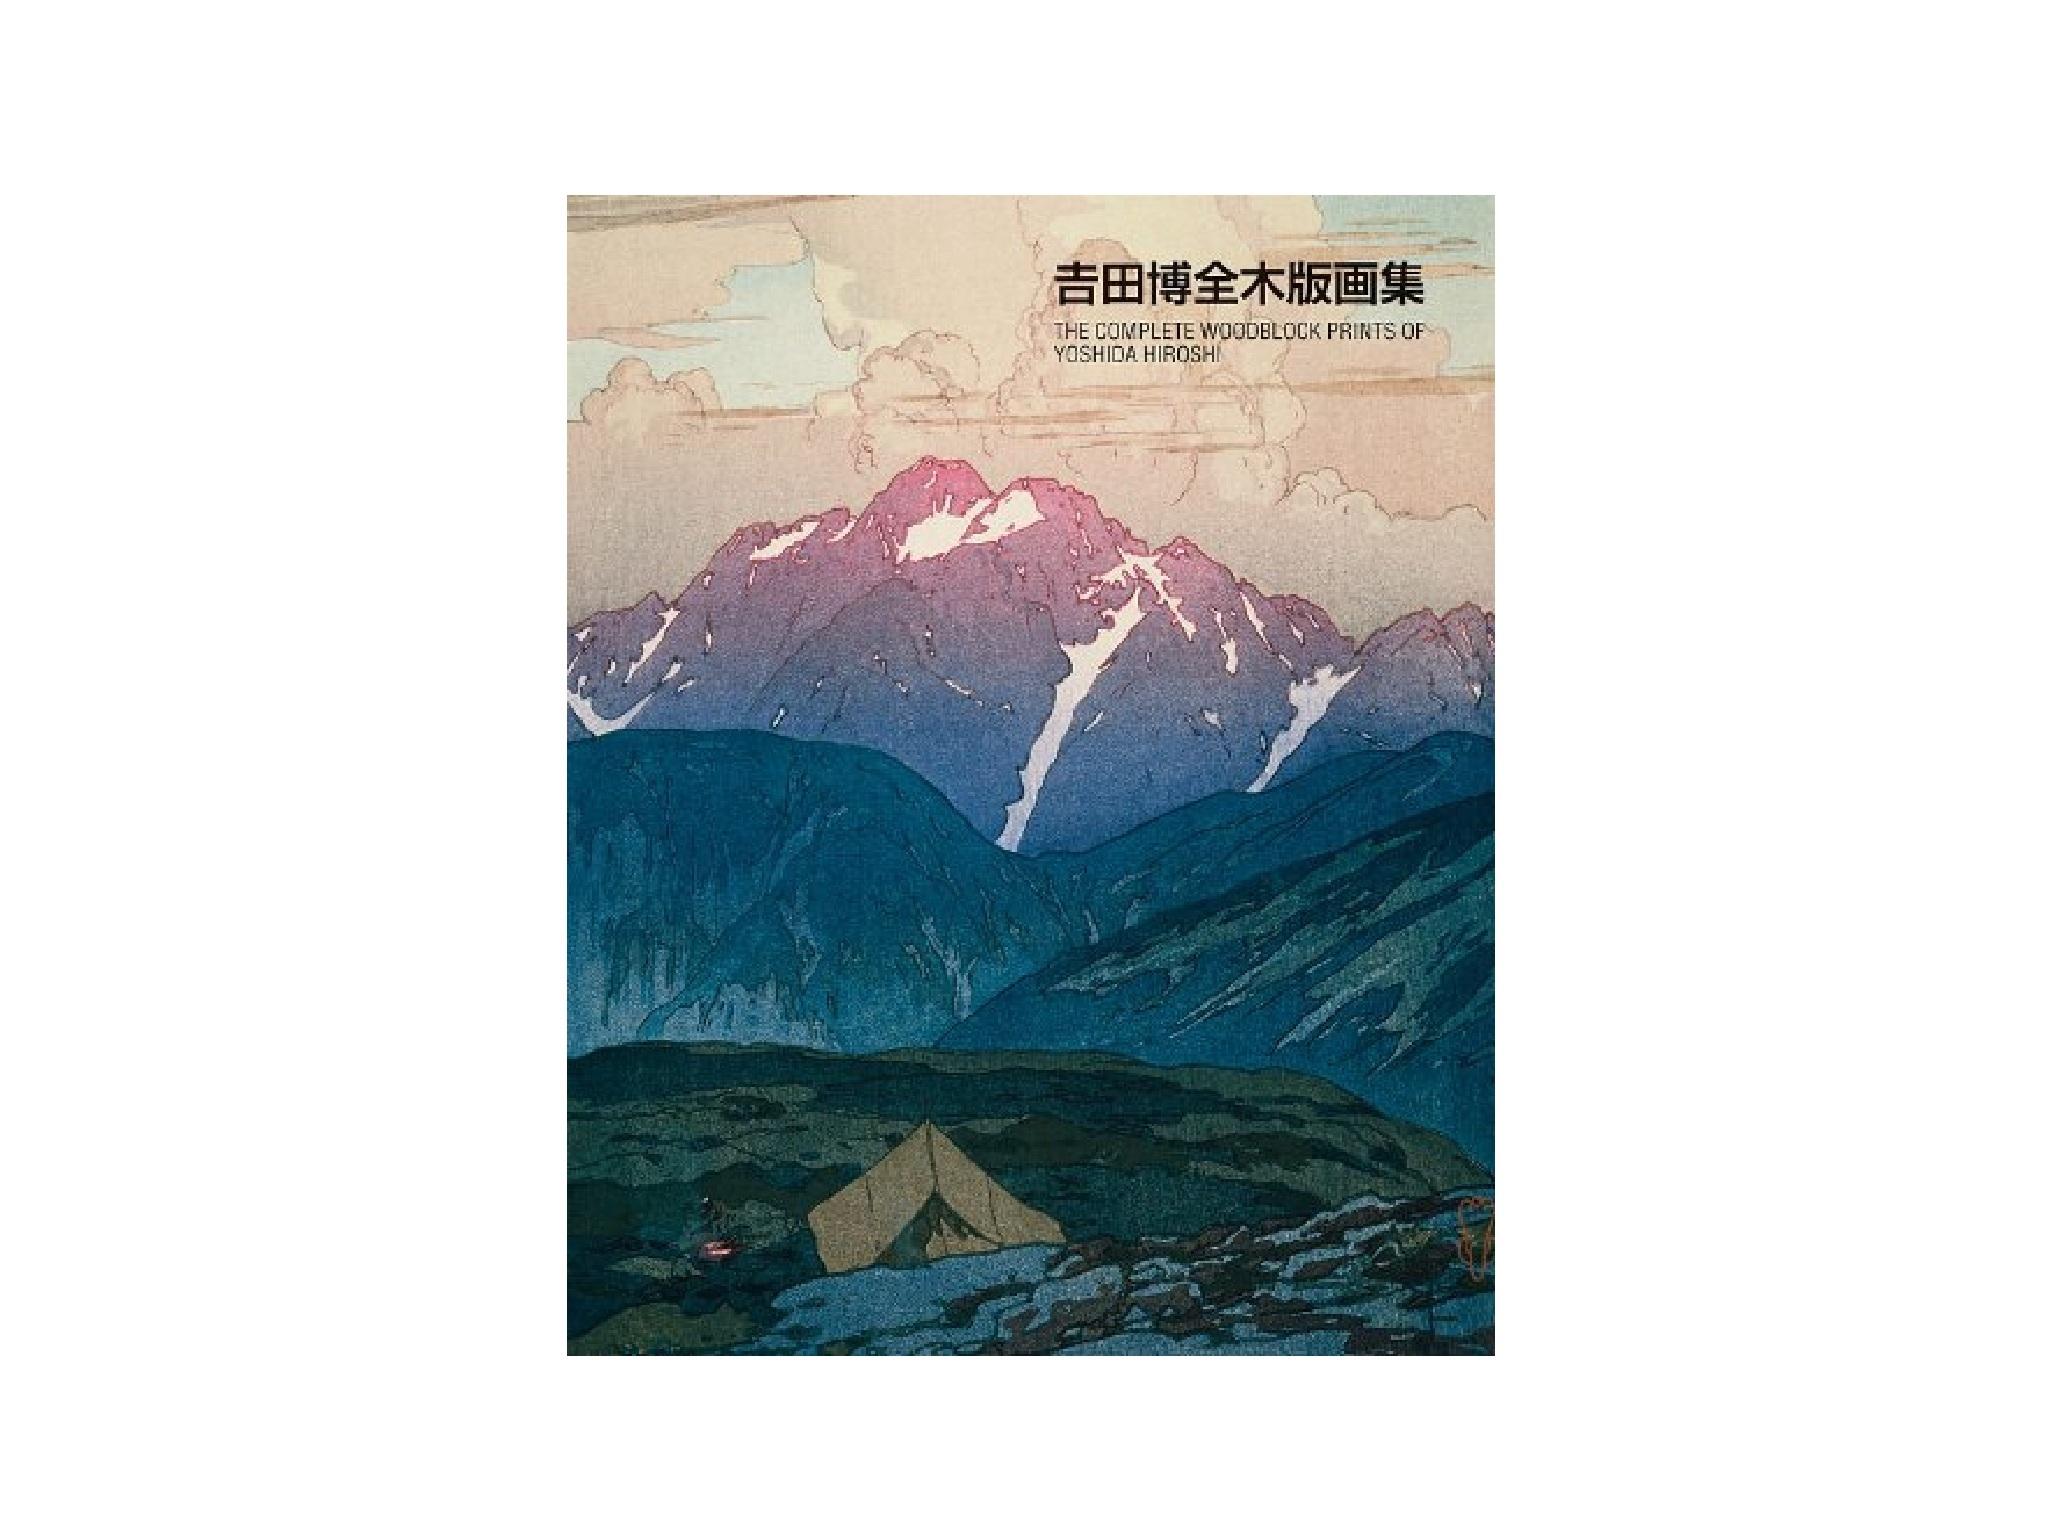 Livro, Xilogravura, Shin-hanga, The complete woodblock prints